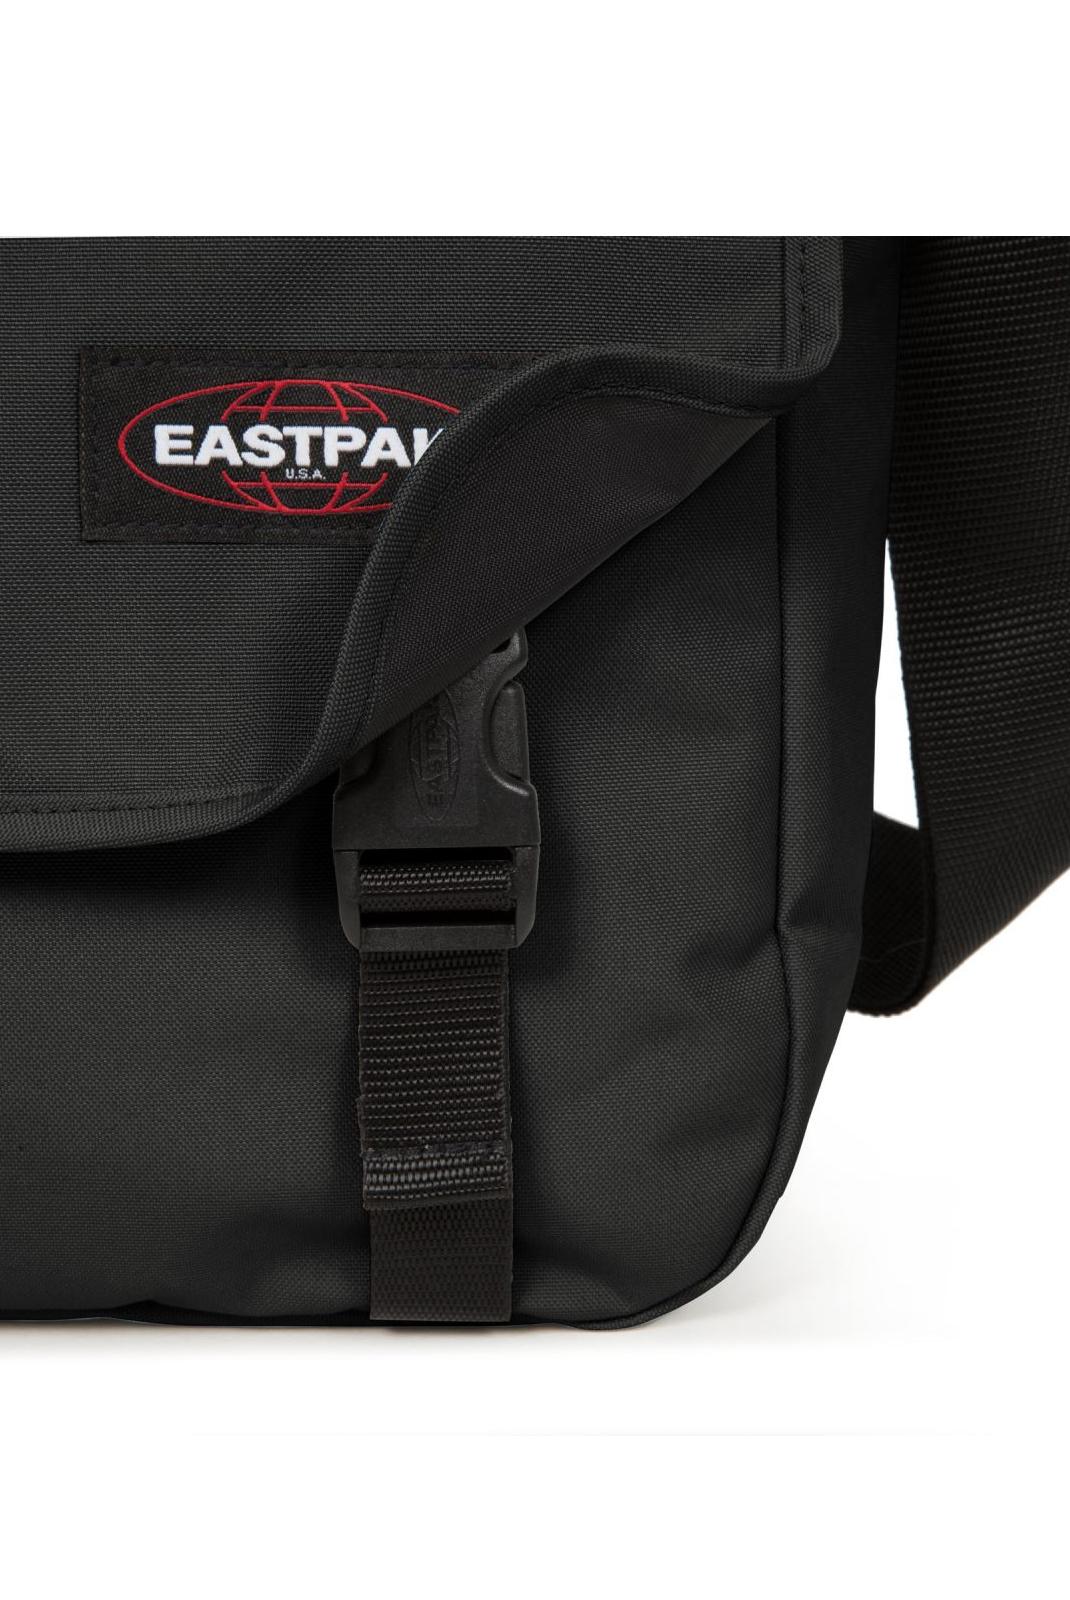 Sac porté épaule  Eastpak EK26E008  008 NOIR